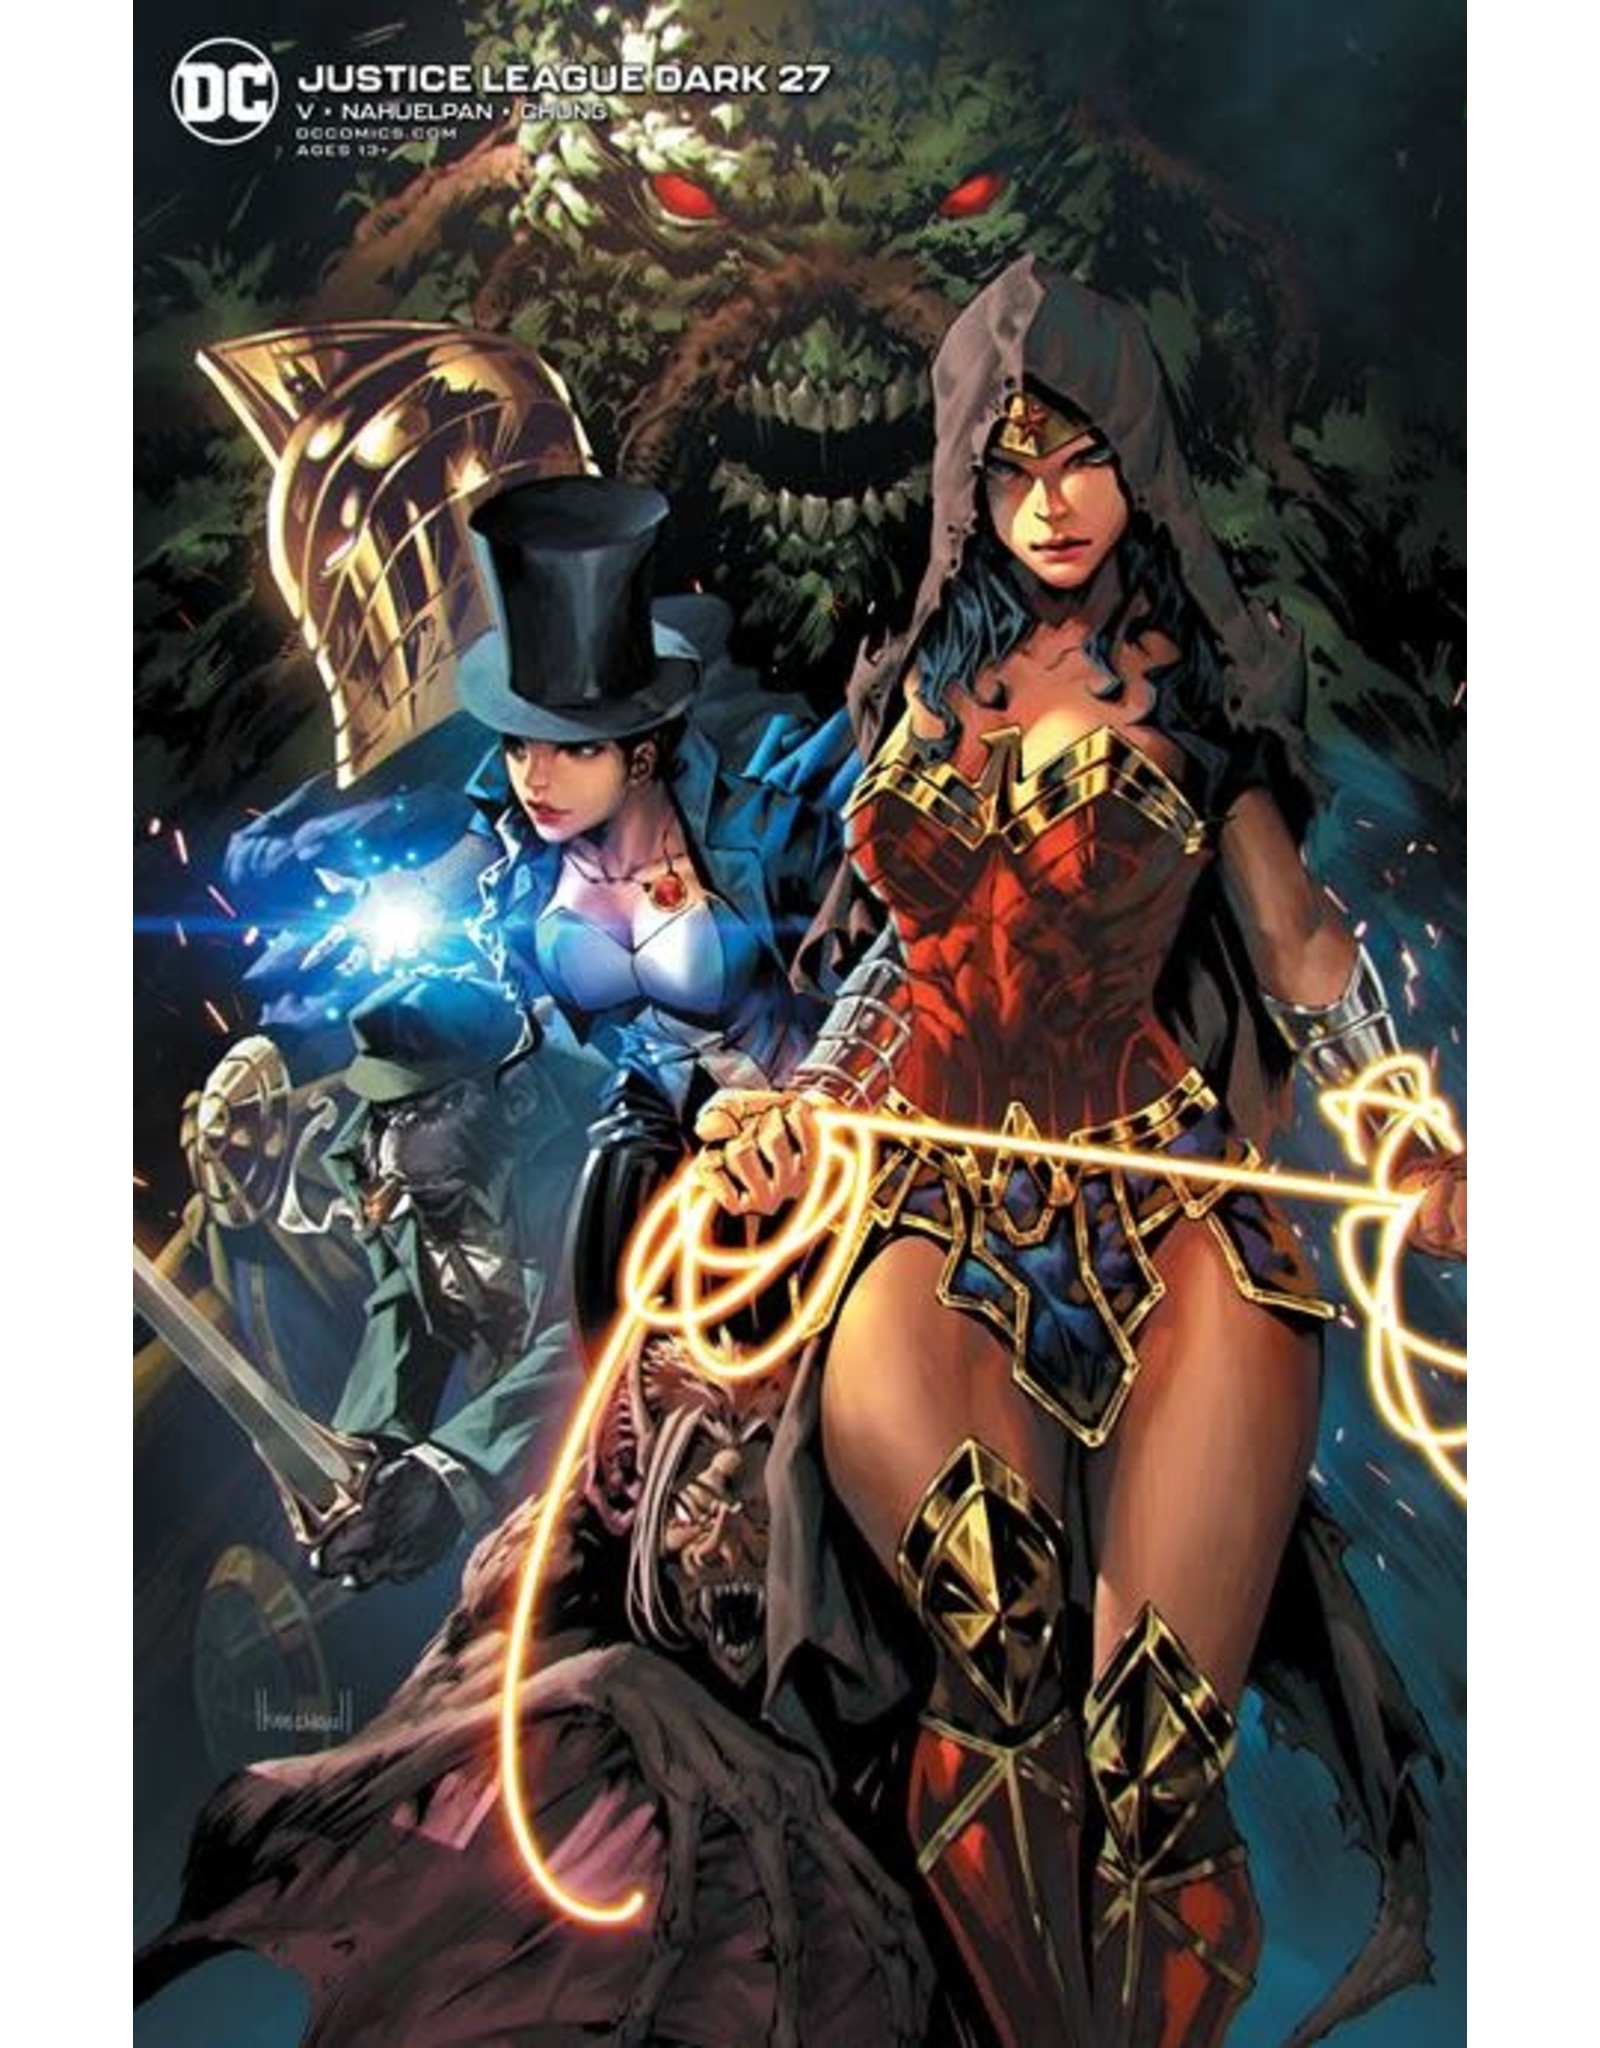 DC Comics JUSTICE LEAGUE DARK #27 CVR B KAEL NGU VAR